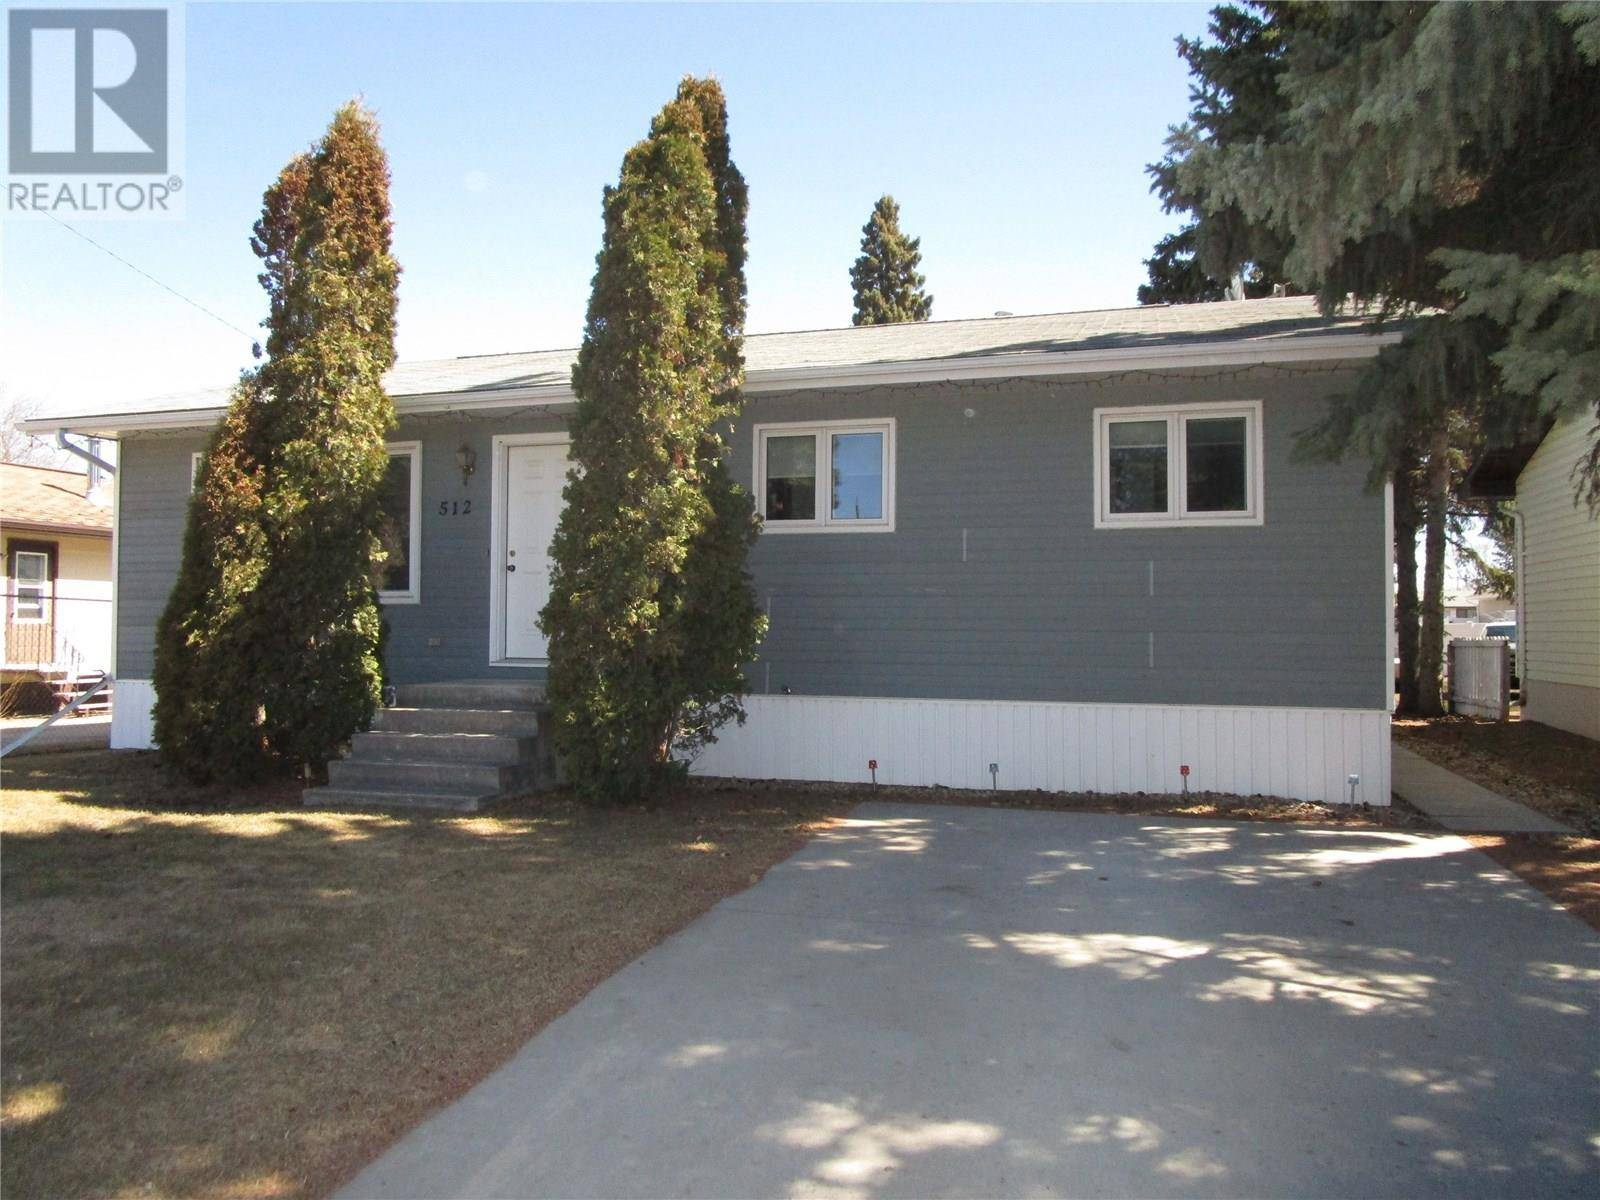 House for sale at 512 4th St E Wynyard Saskatchewan - MLS: SK767810